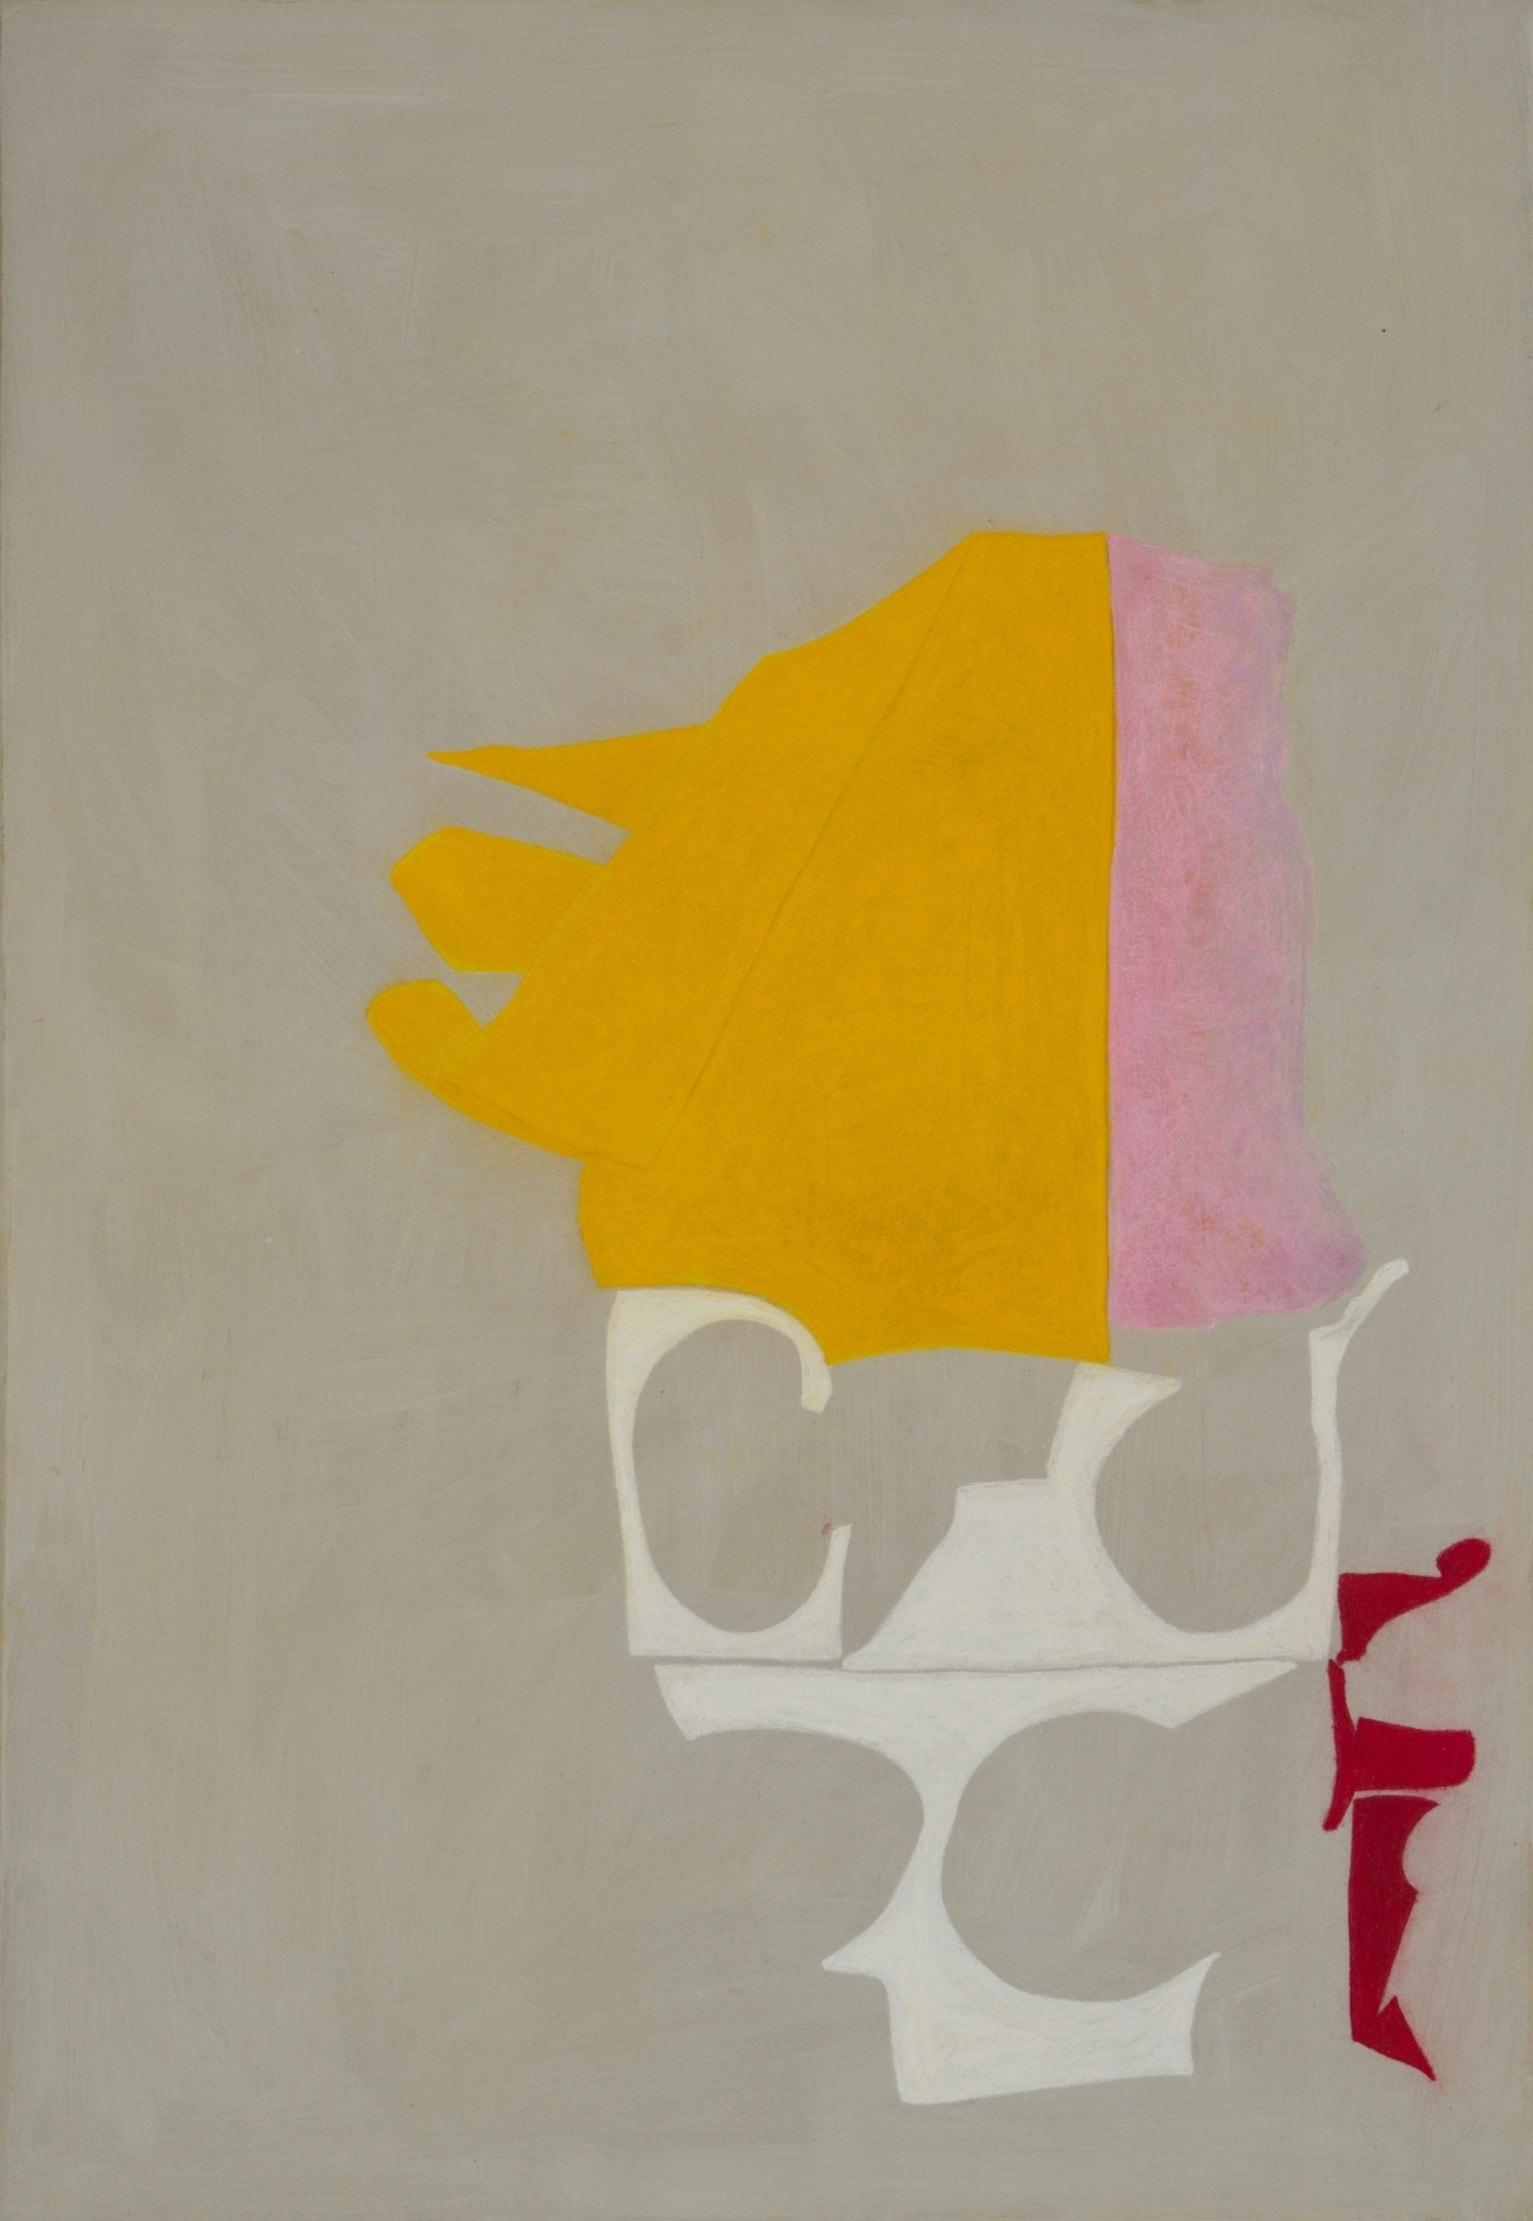 Frenzi Rigling Smolka Contemporary Pastell auf Papier